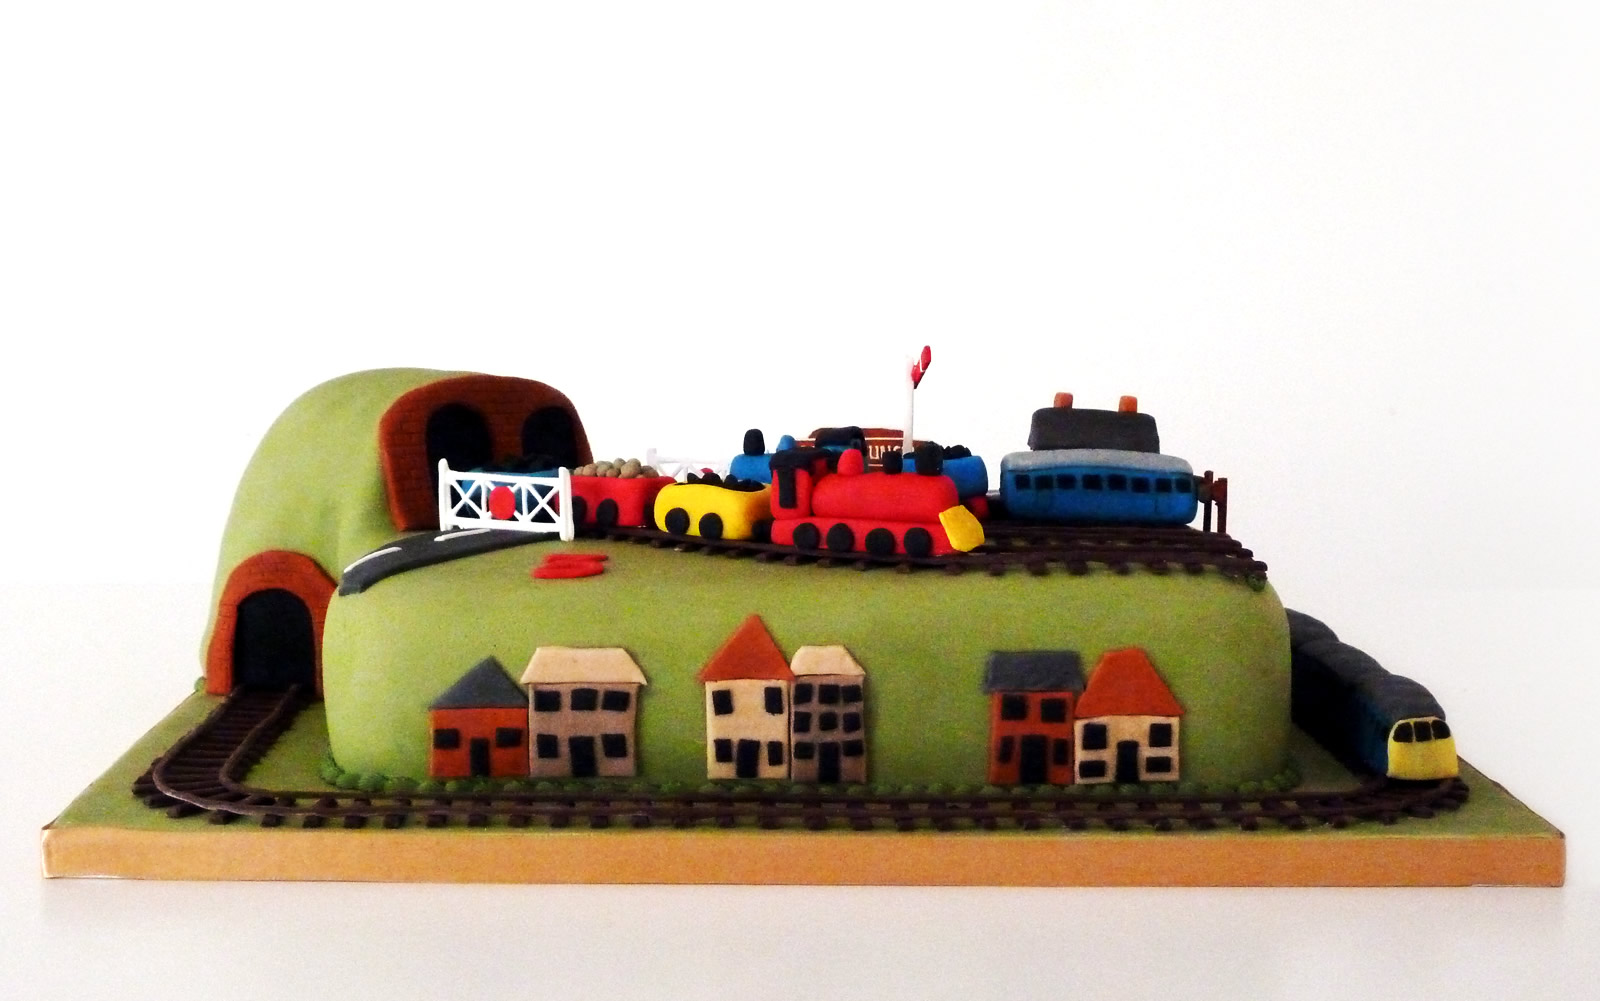 train track novelty birthday cake  u00ab susie u0026 39 s cakes